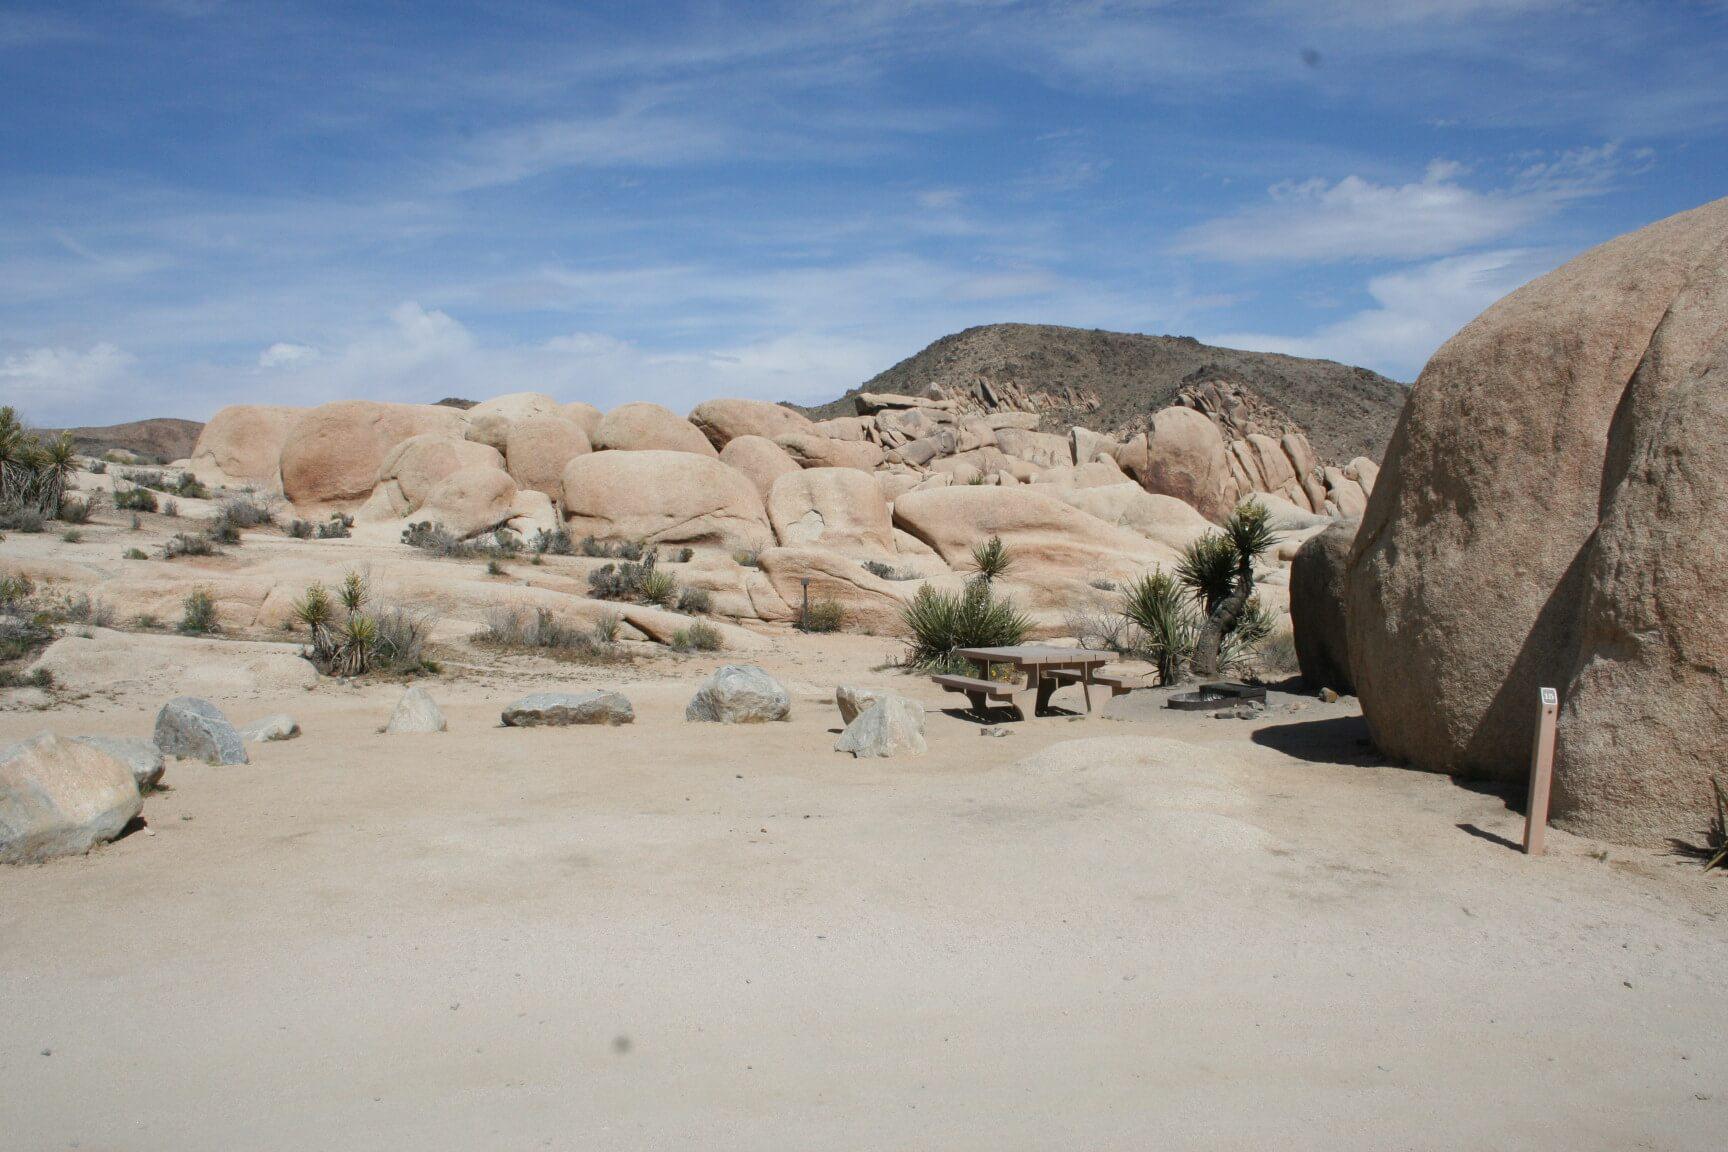 Western US - Fall Camping Guide_Joshua Tree National Park_White Tank_015_CampsitePhotos_CA